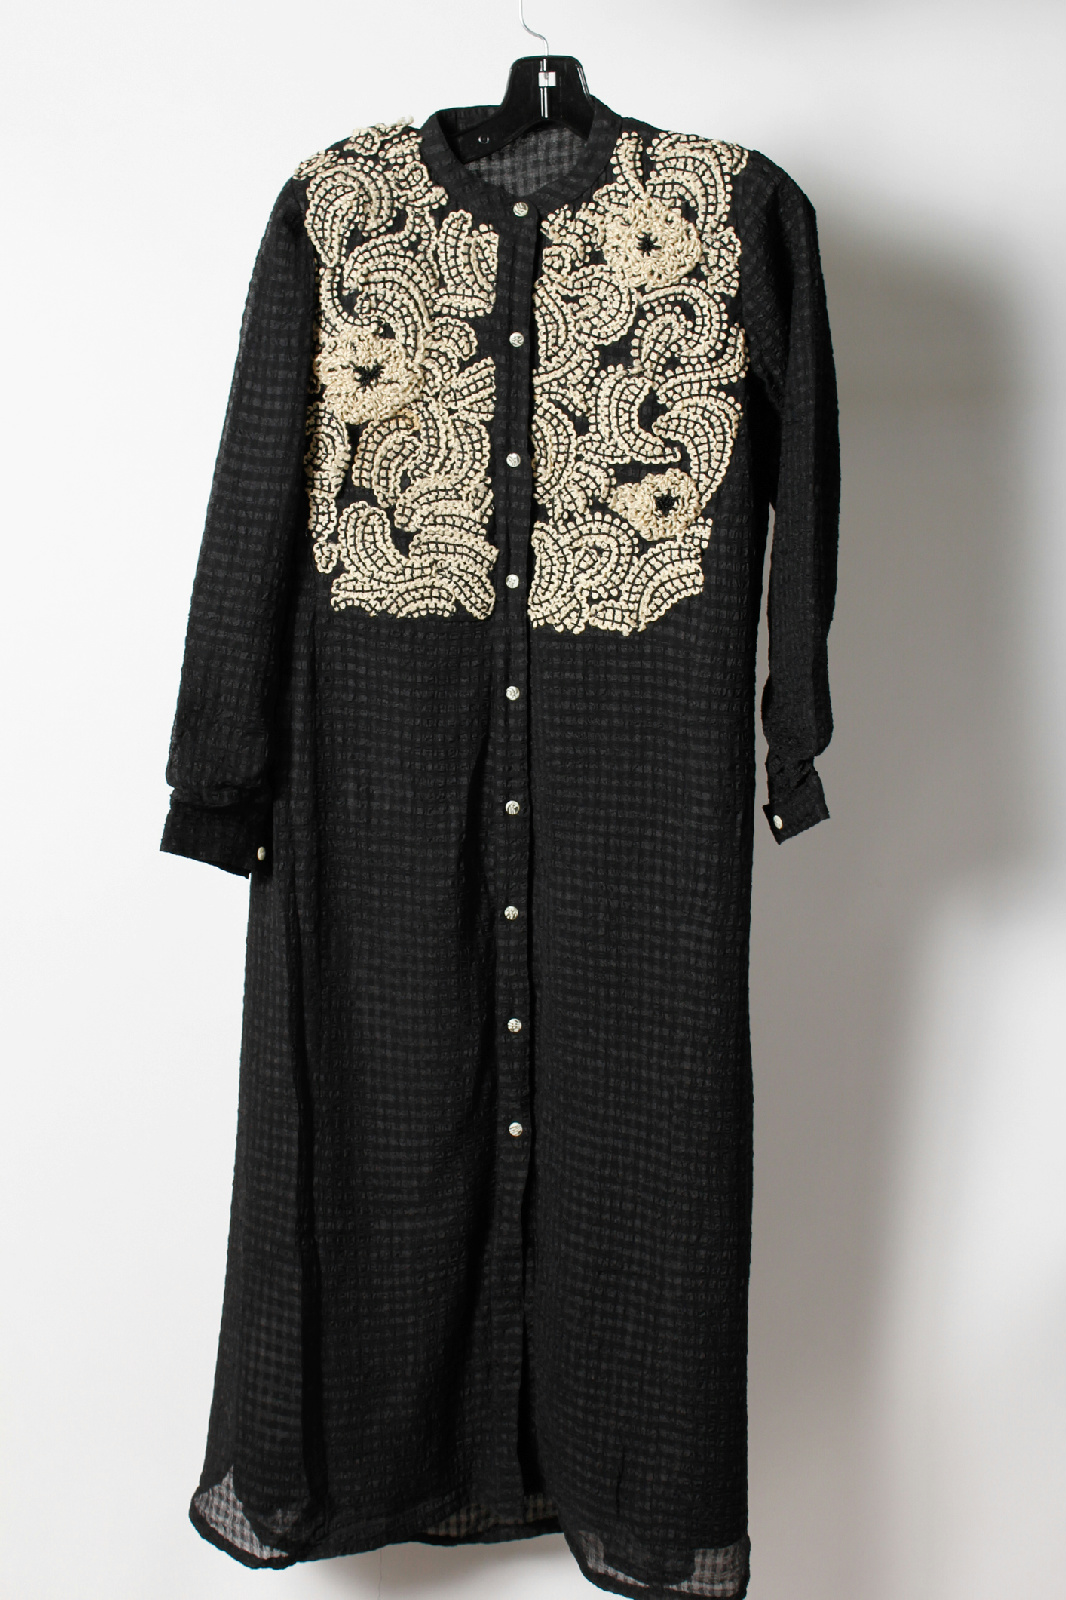 Vintage Black Layered Embroidered Caftan Jacket | EBay